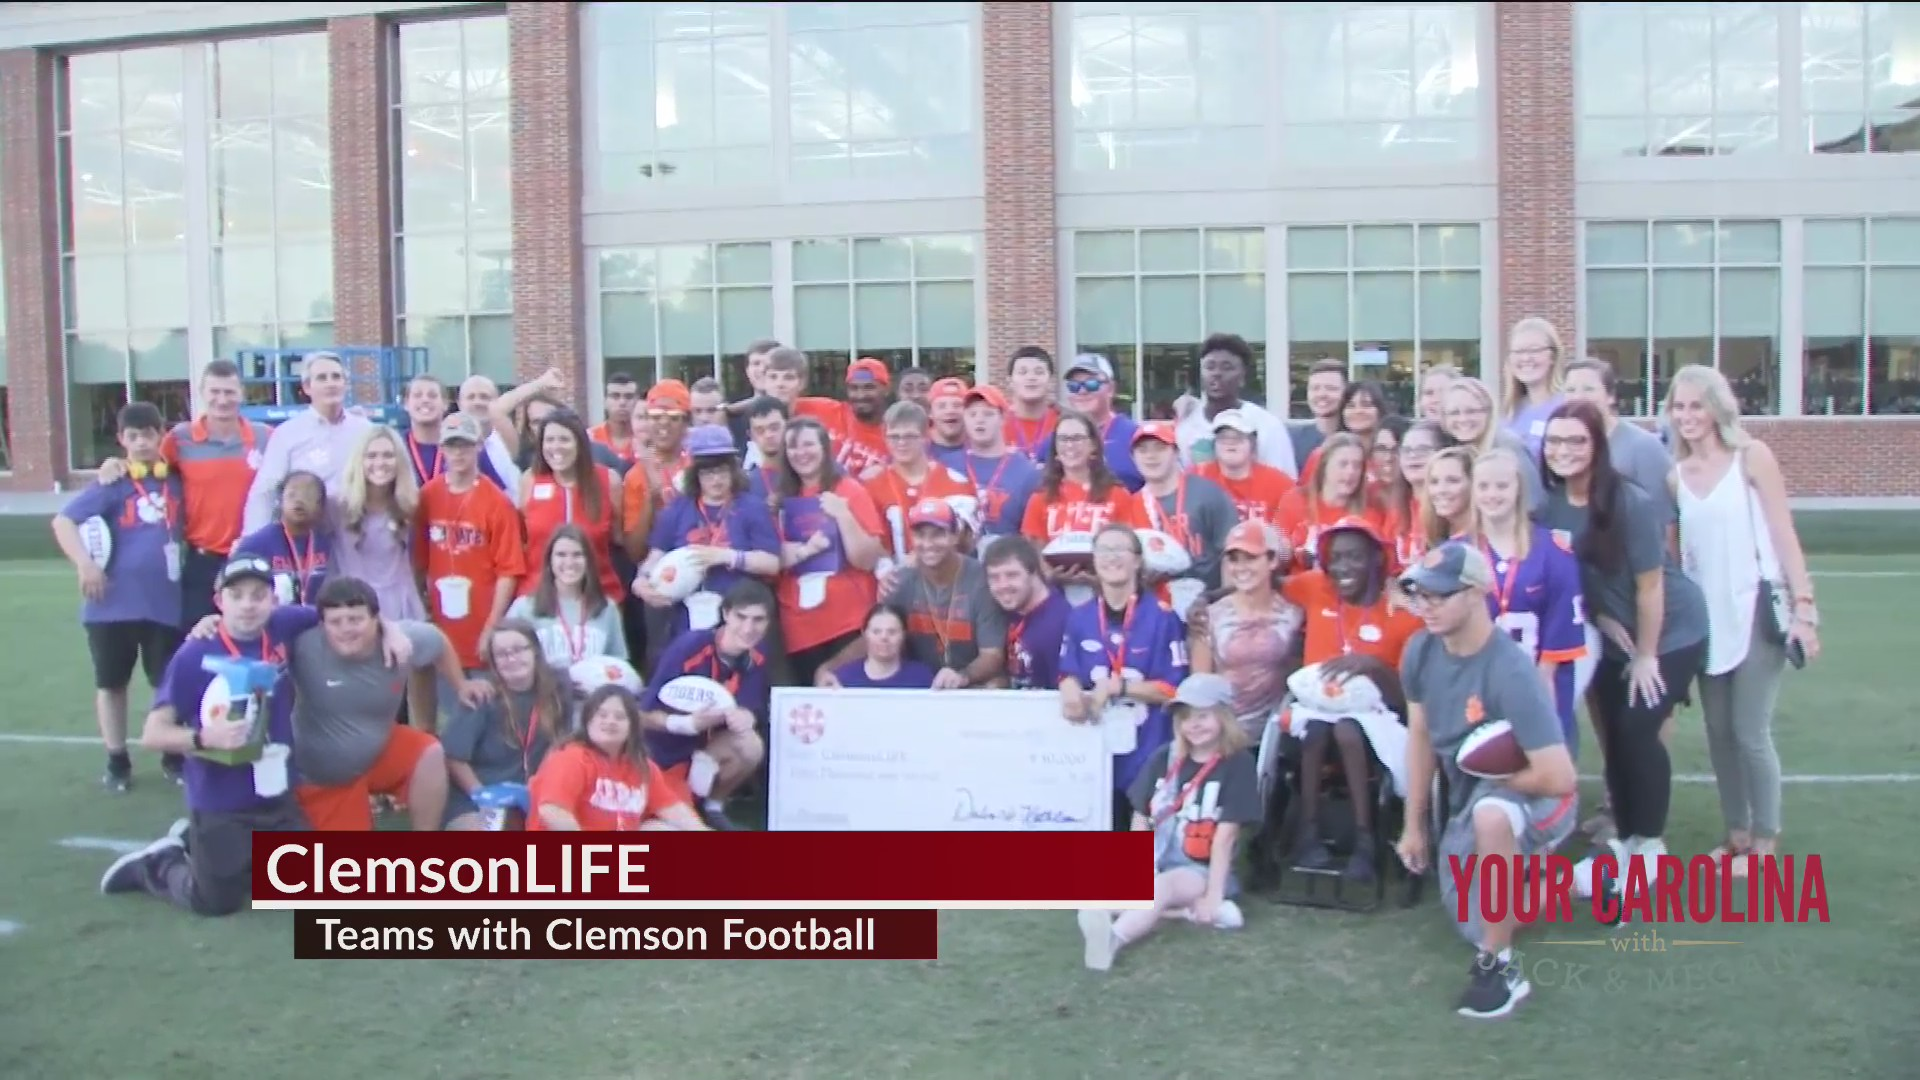 Good News - ClemsonLIFE Teams with Clemson Football